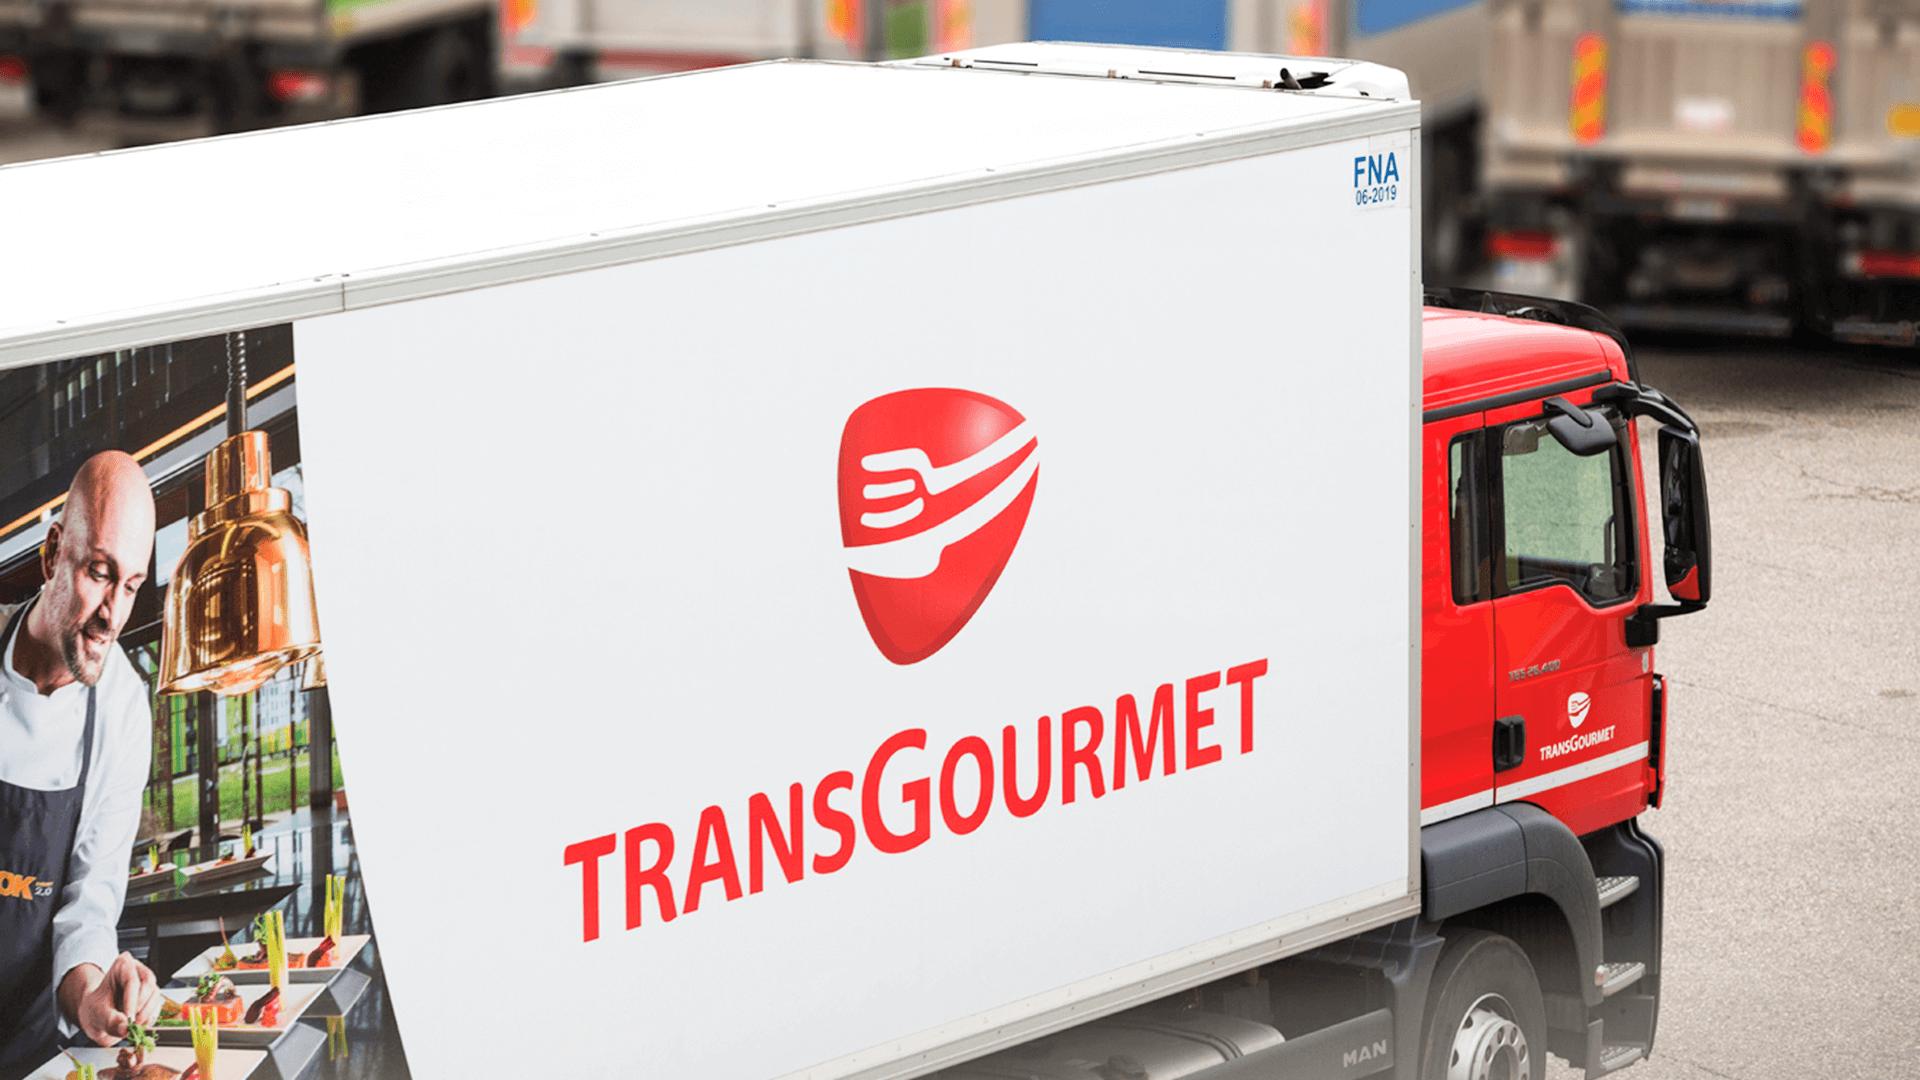 Transgourmet delivery van